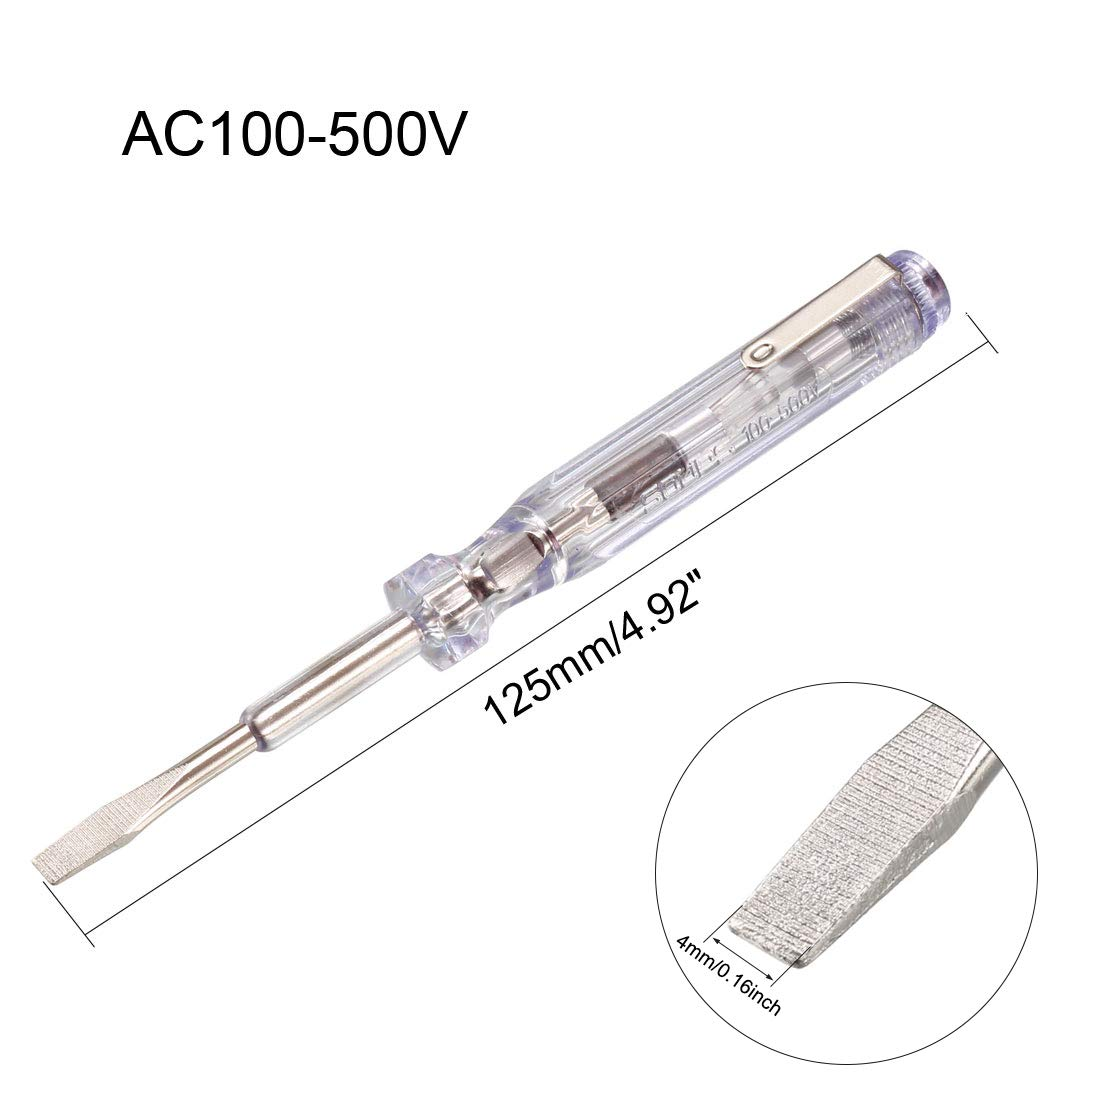 Ac100-500v 4 mm ranurado pluma probador de ancho de punta plana destornillador Sourcingmap